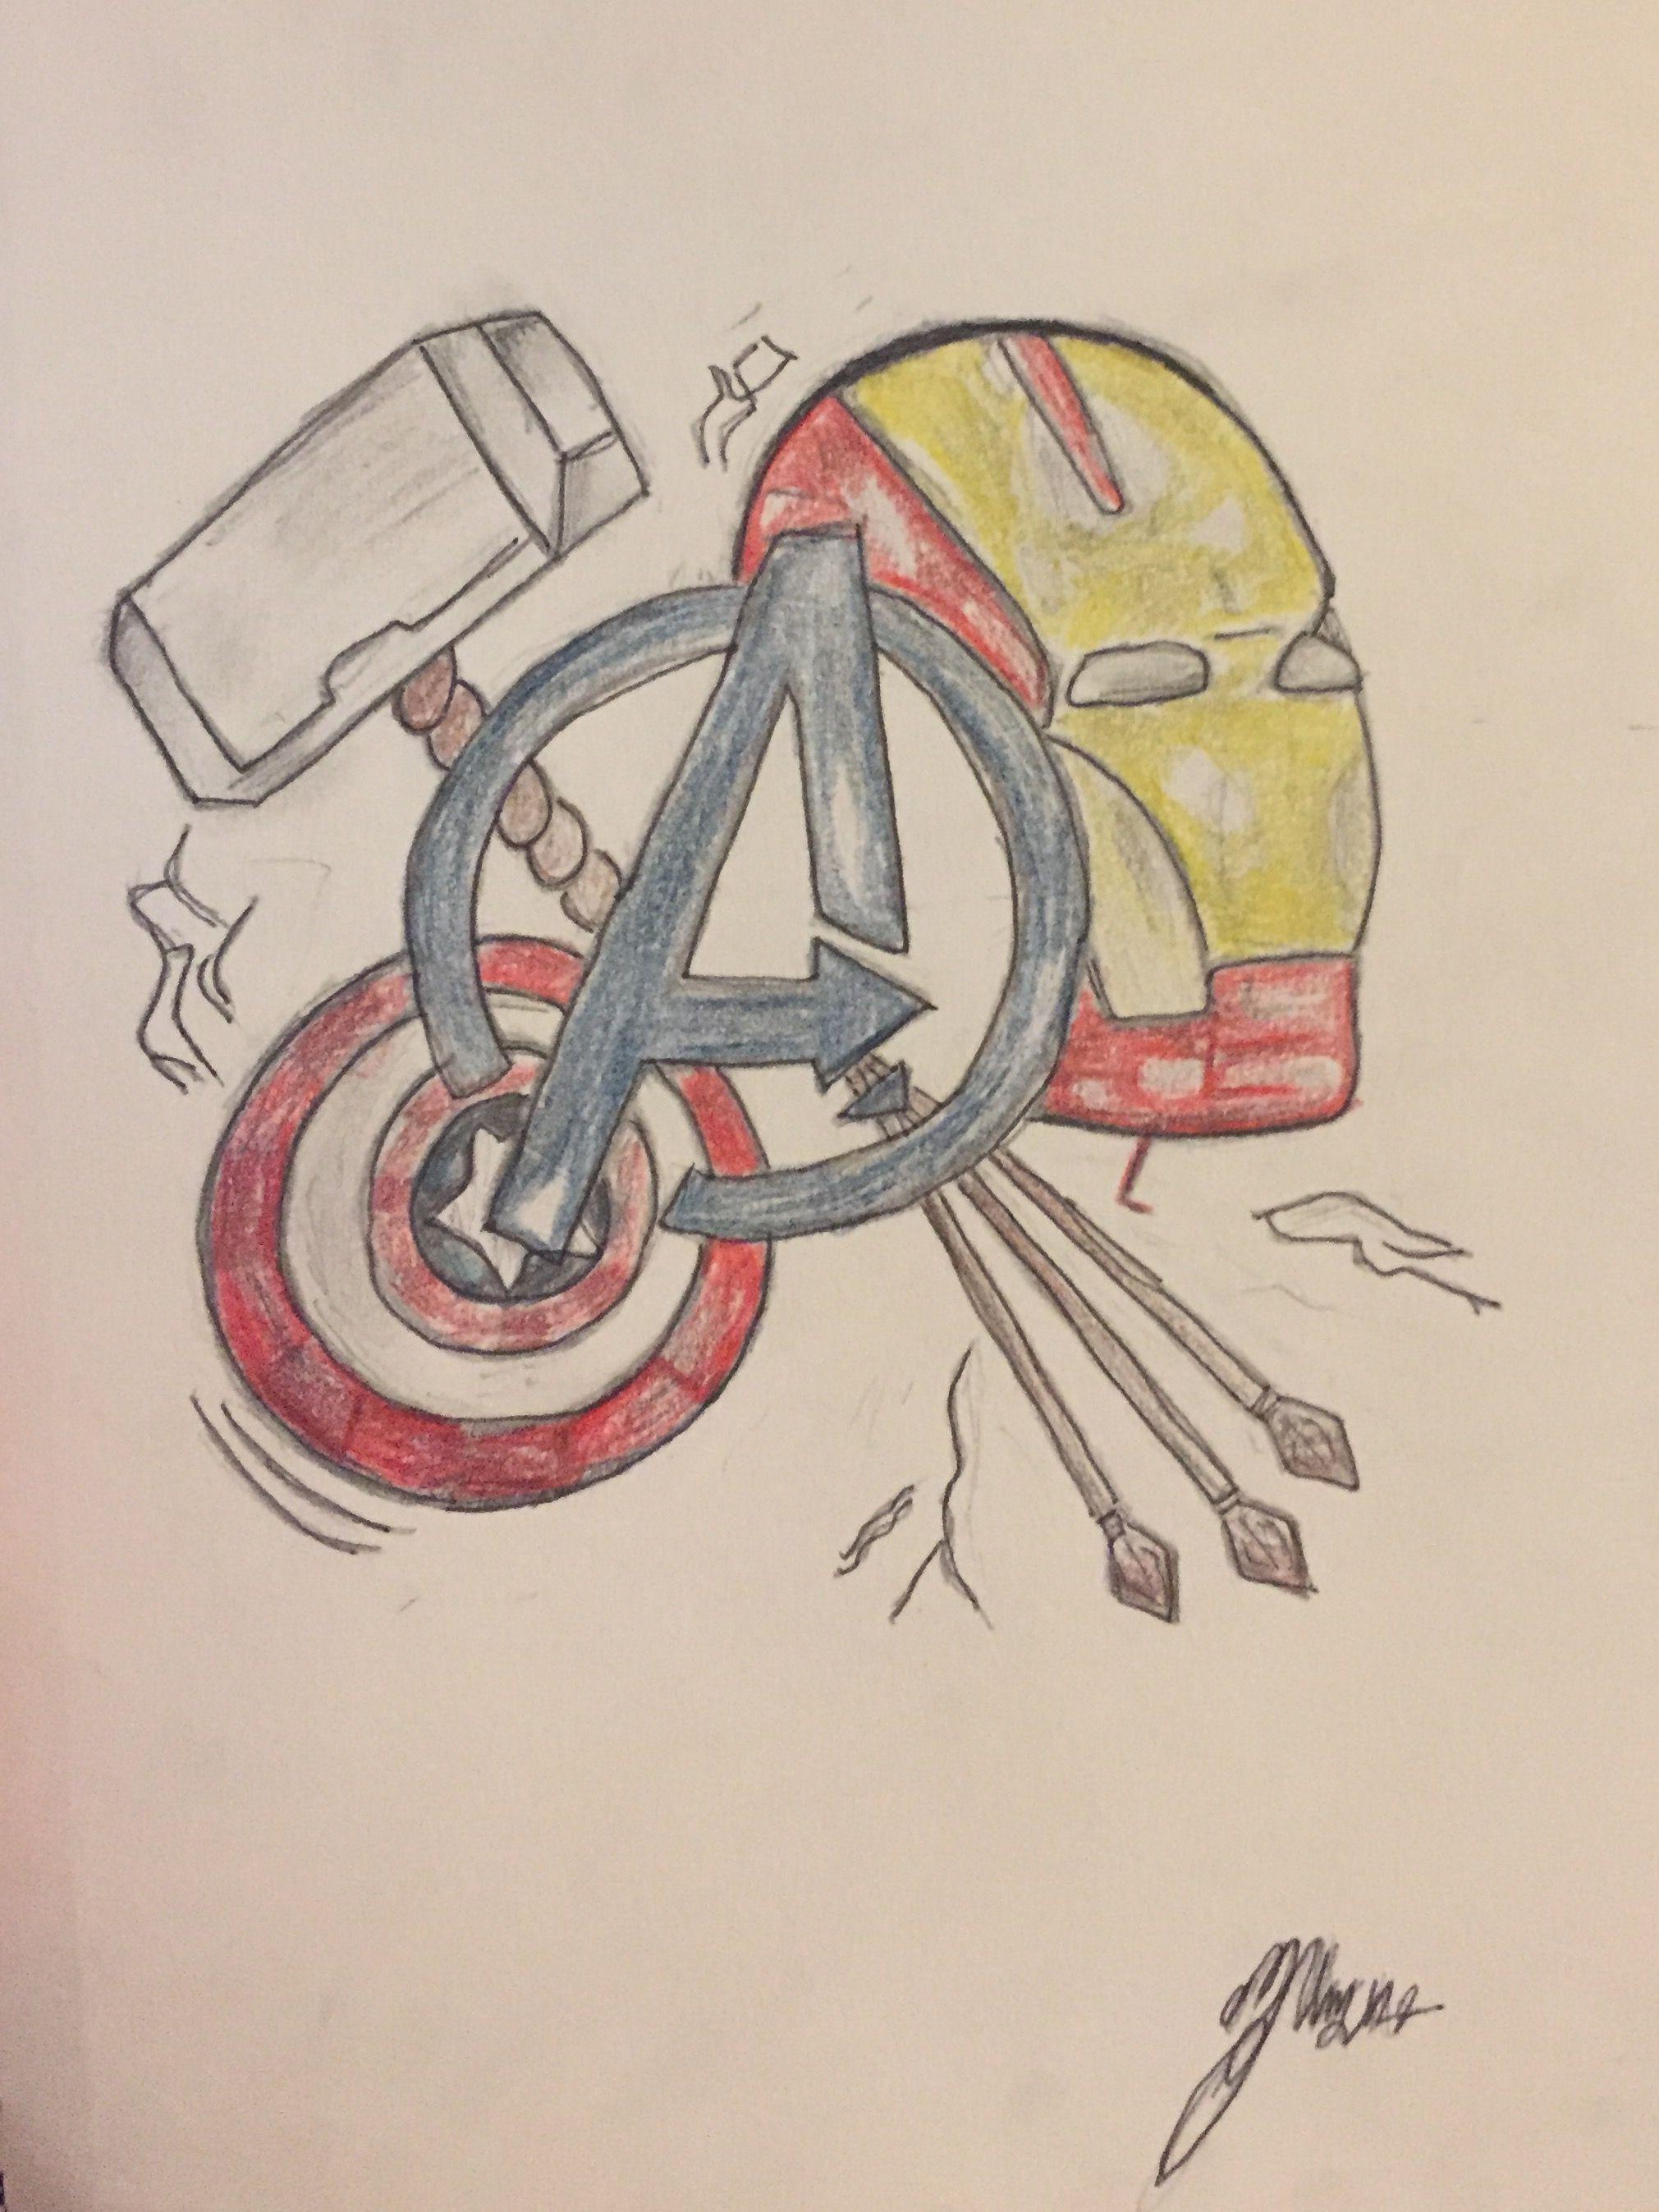 Avengers Drawing Avengers Drawings Avengers Logo Avengers Wall Art